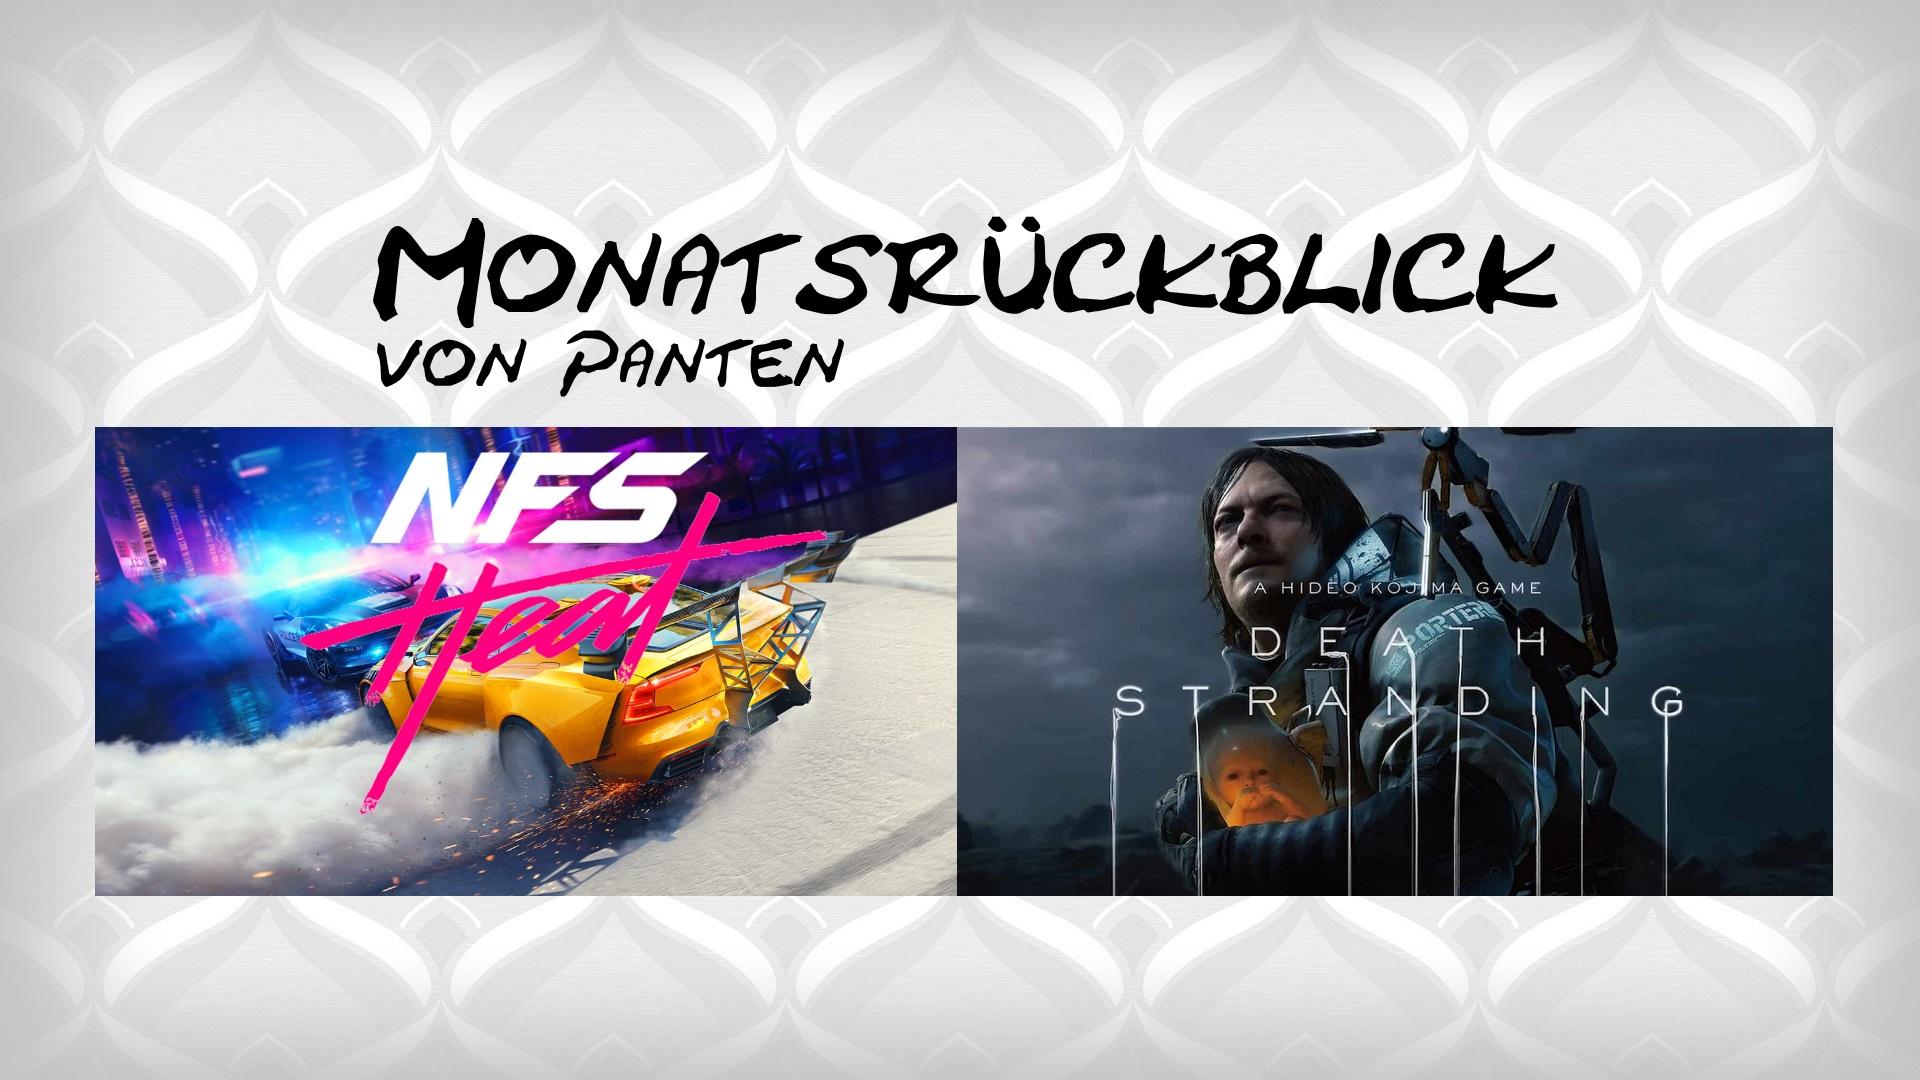 Monatsrückblick November 2019